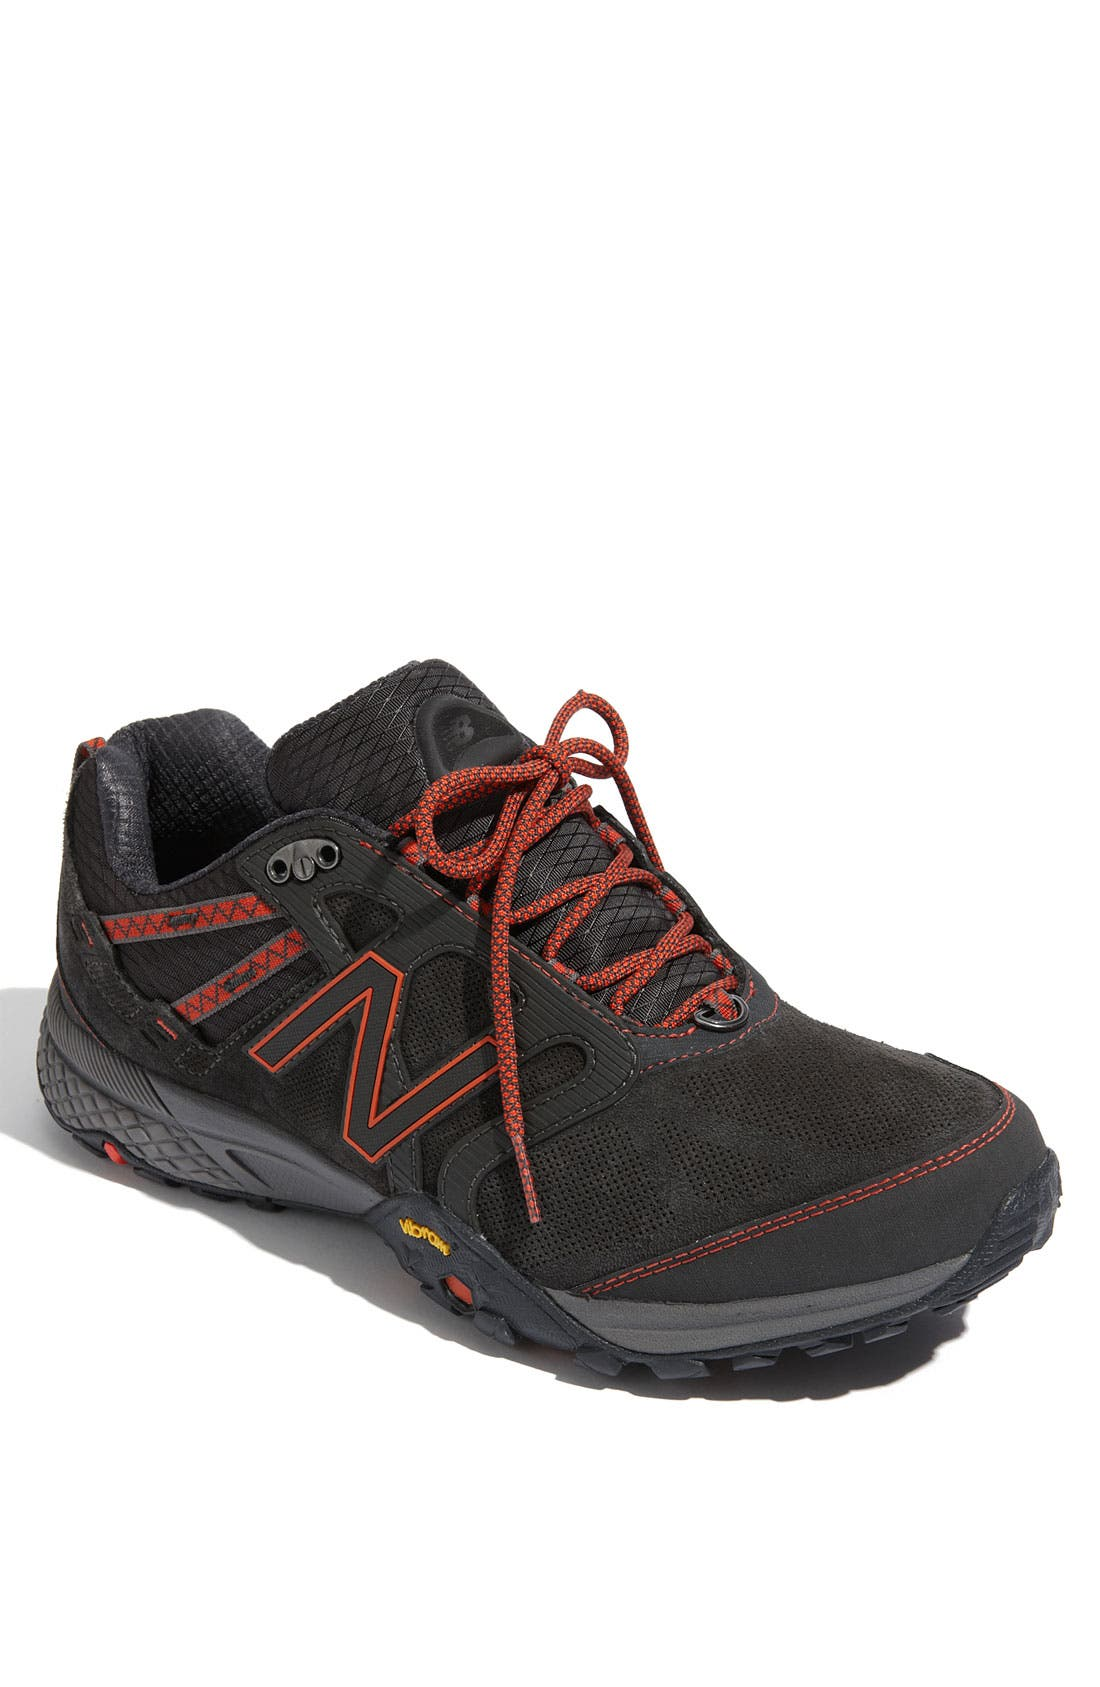 Alternate Image 1 Selected - New Balance '1521' Multi Sport Shoe (Men)